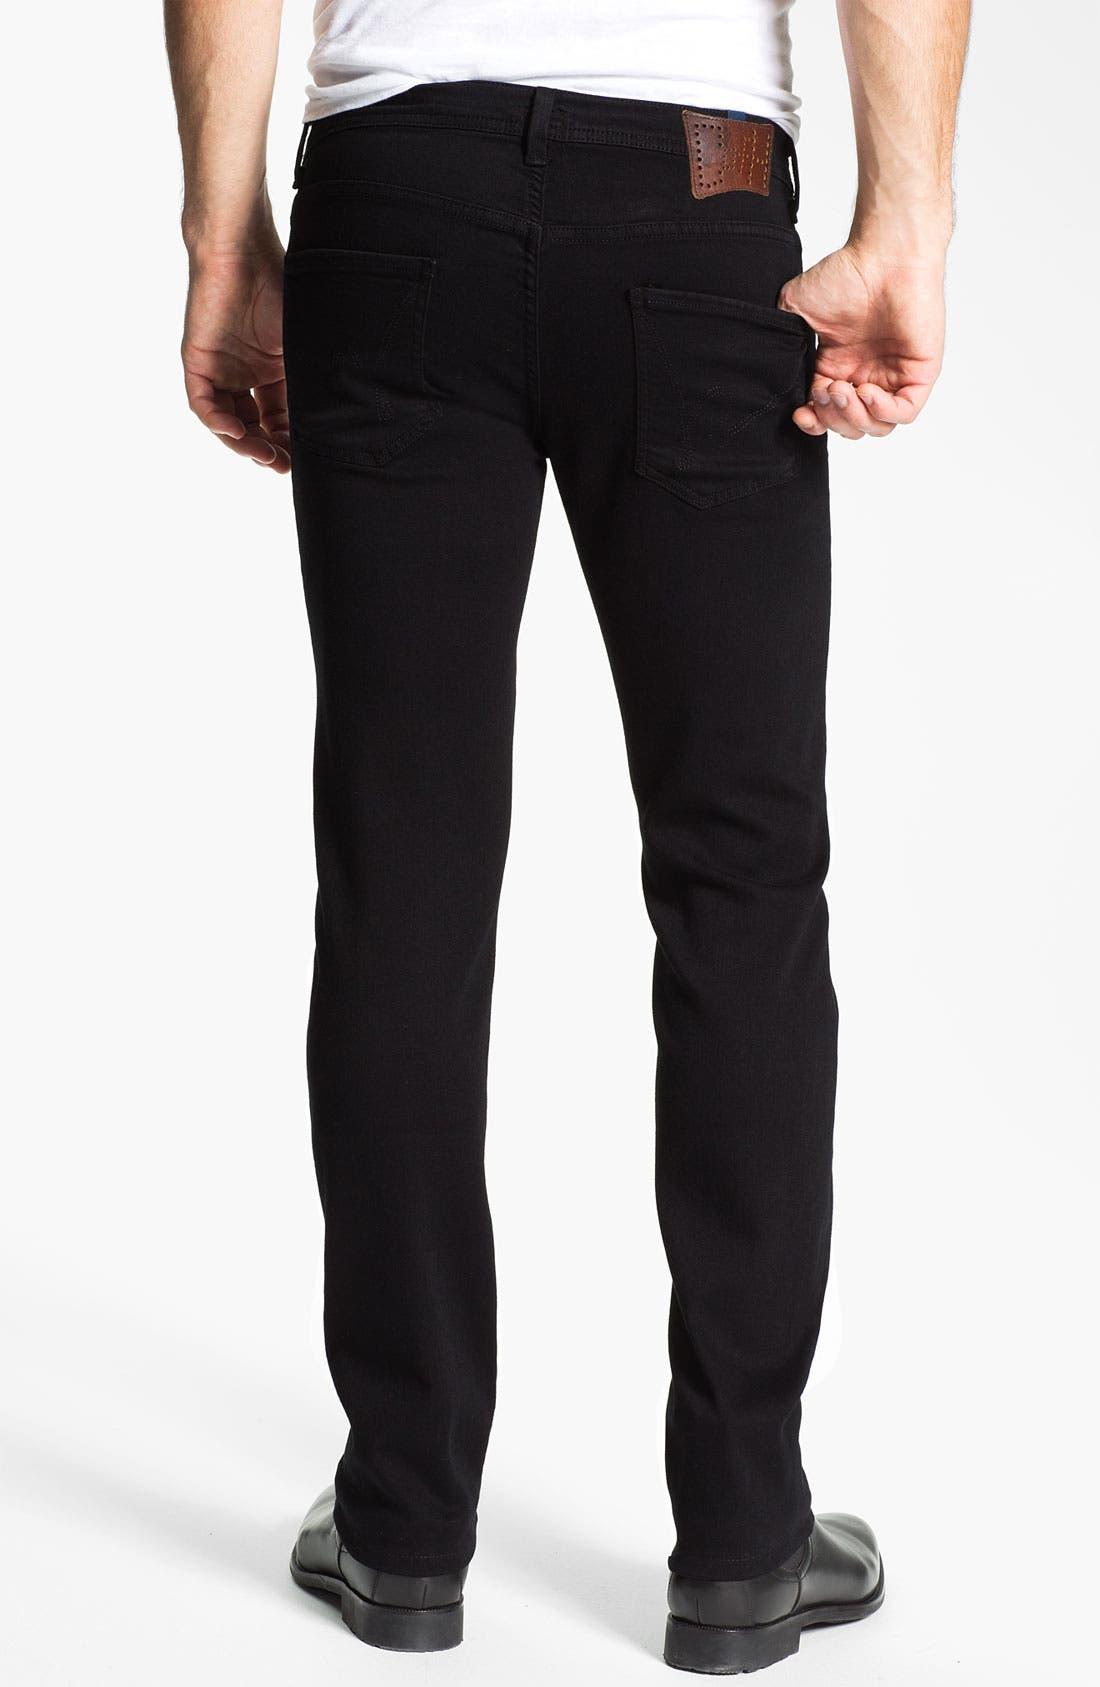 Alternate Image 2  - Citizens of Humanity 'Adonis' Comfort Slim Fit Jeans (Brandon Black)